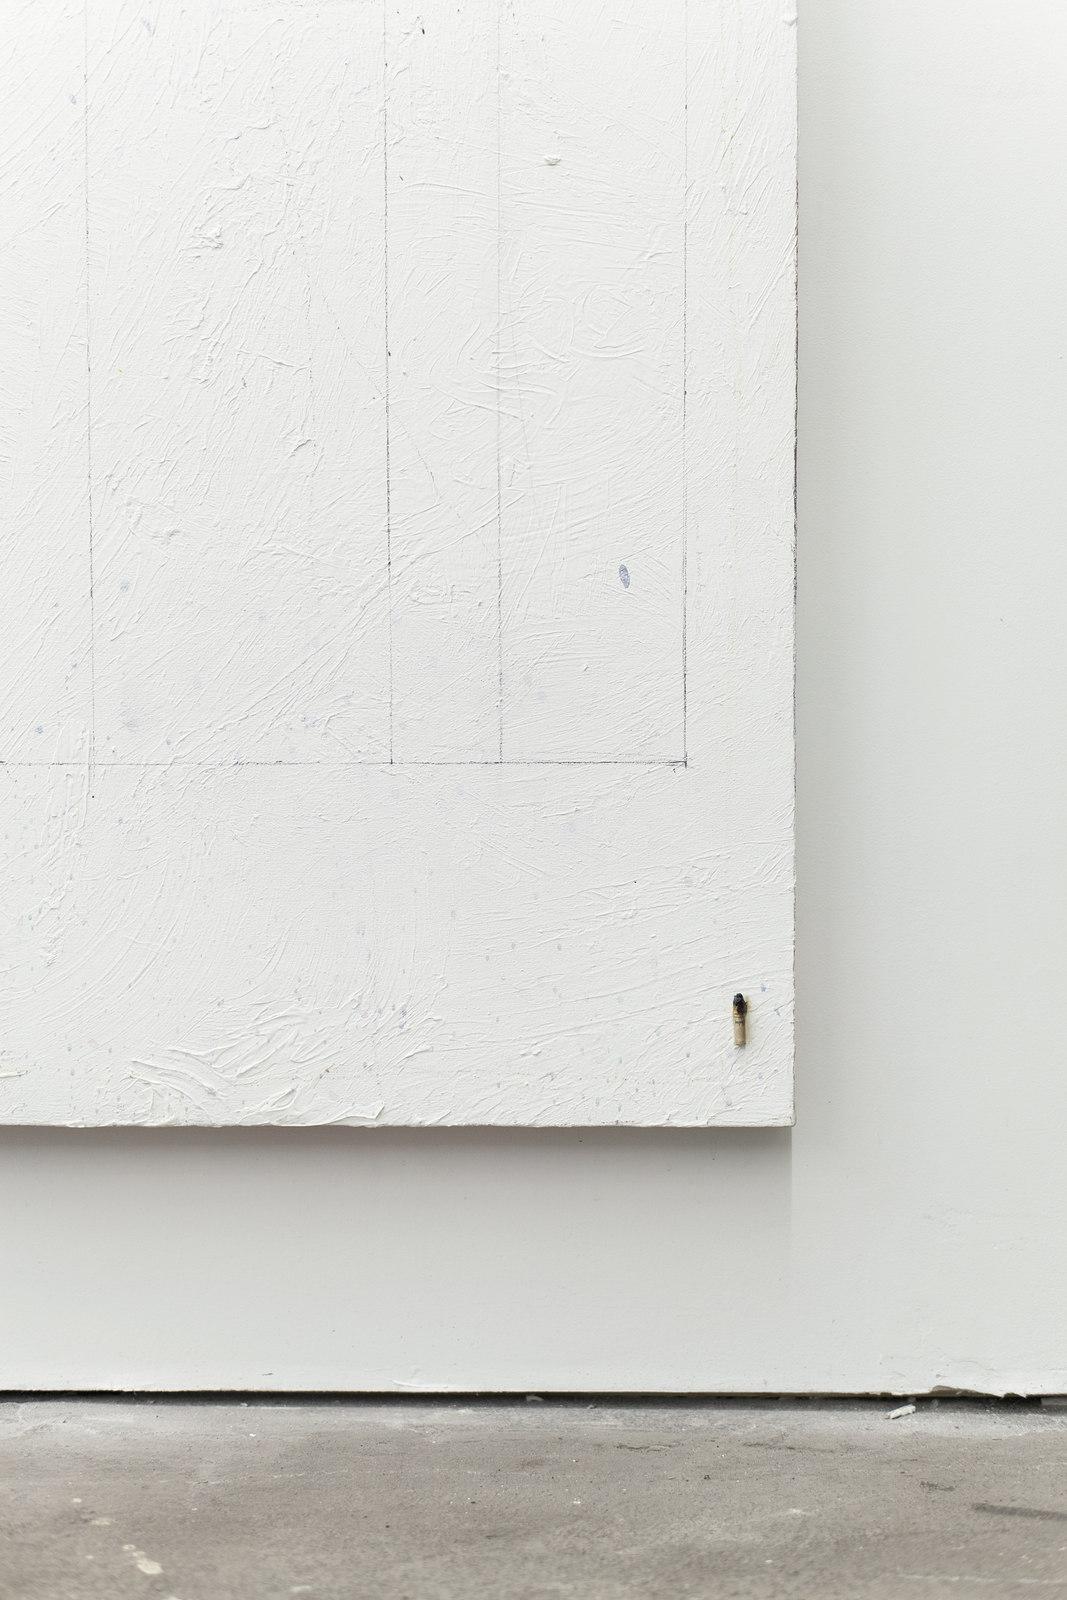 023_Jean-François Lauda. Untitled 39. Acrylic on canvas, collage, cigarette butt.213.5 x 183 cm. 2012_2016. (Detail)